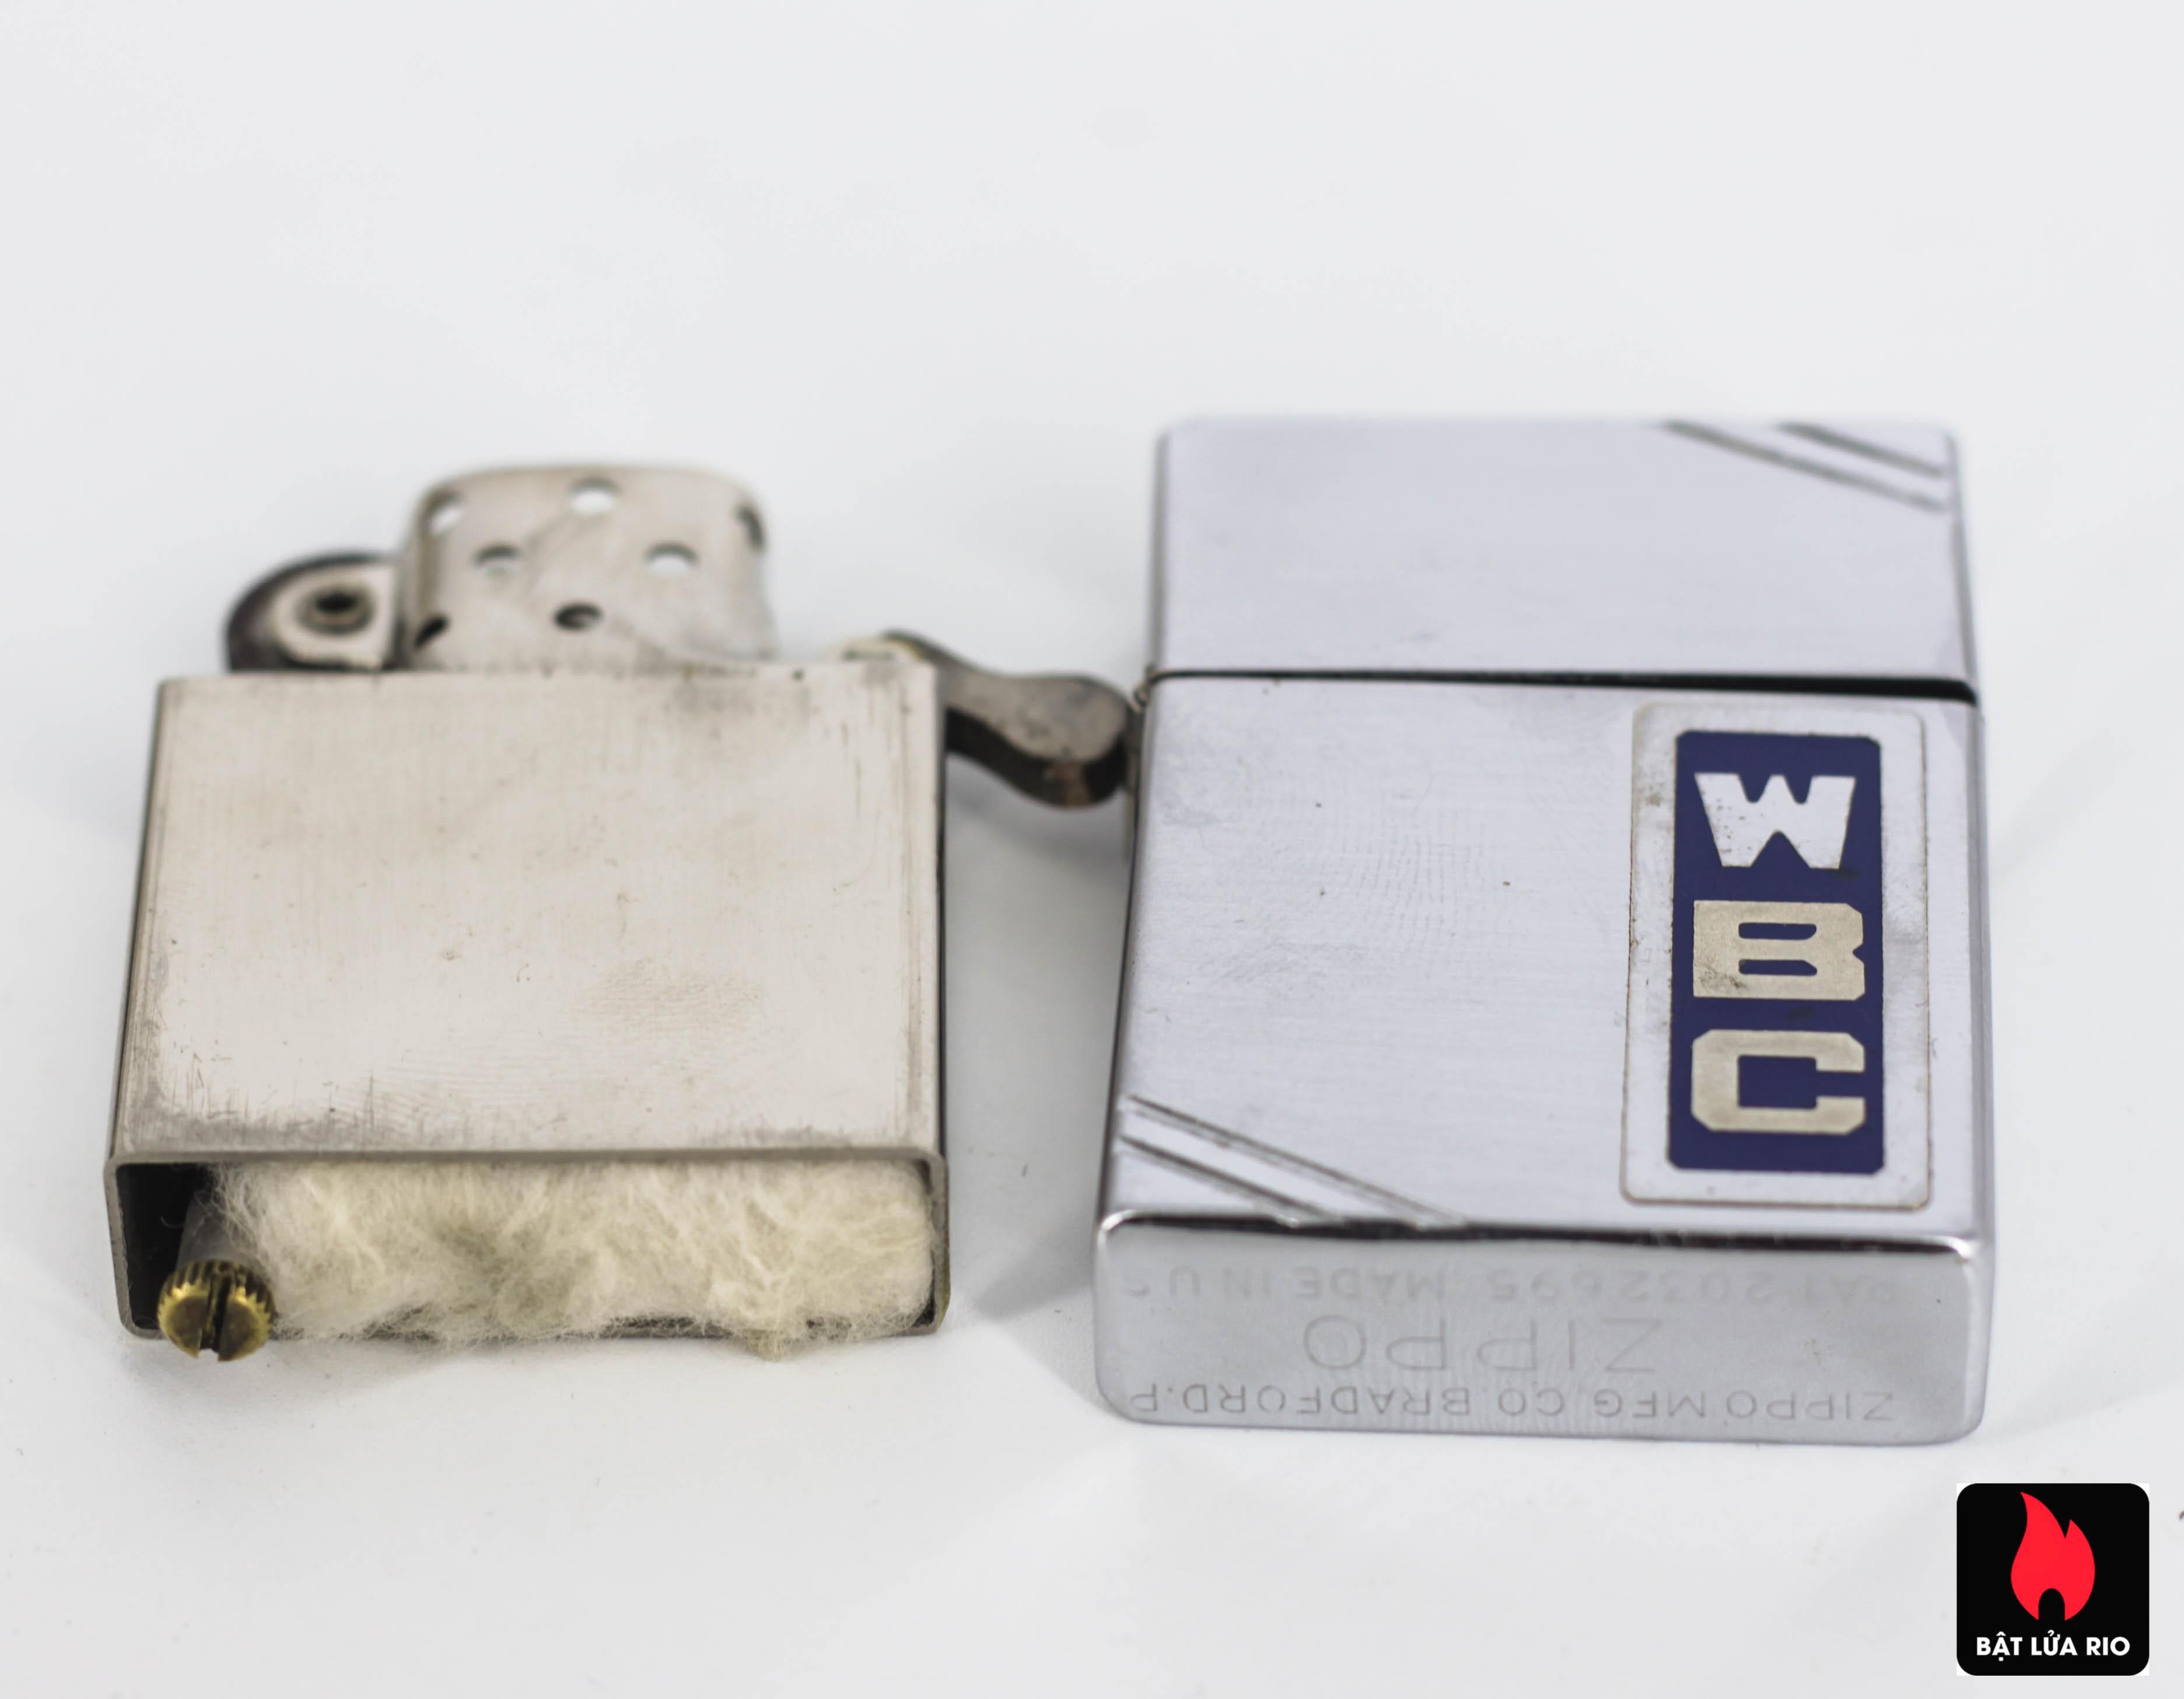 HIẾM – Zippo Xưa 1936 Metallique – W.B.C – Bản Lề 4 Chấu – Ruột Pitton 14 Lỗ 3